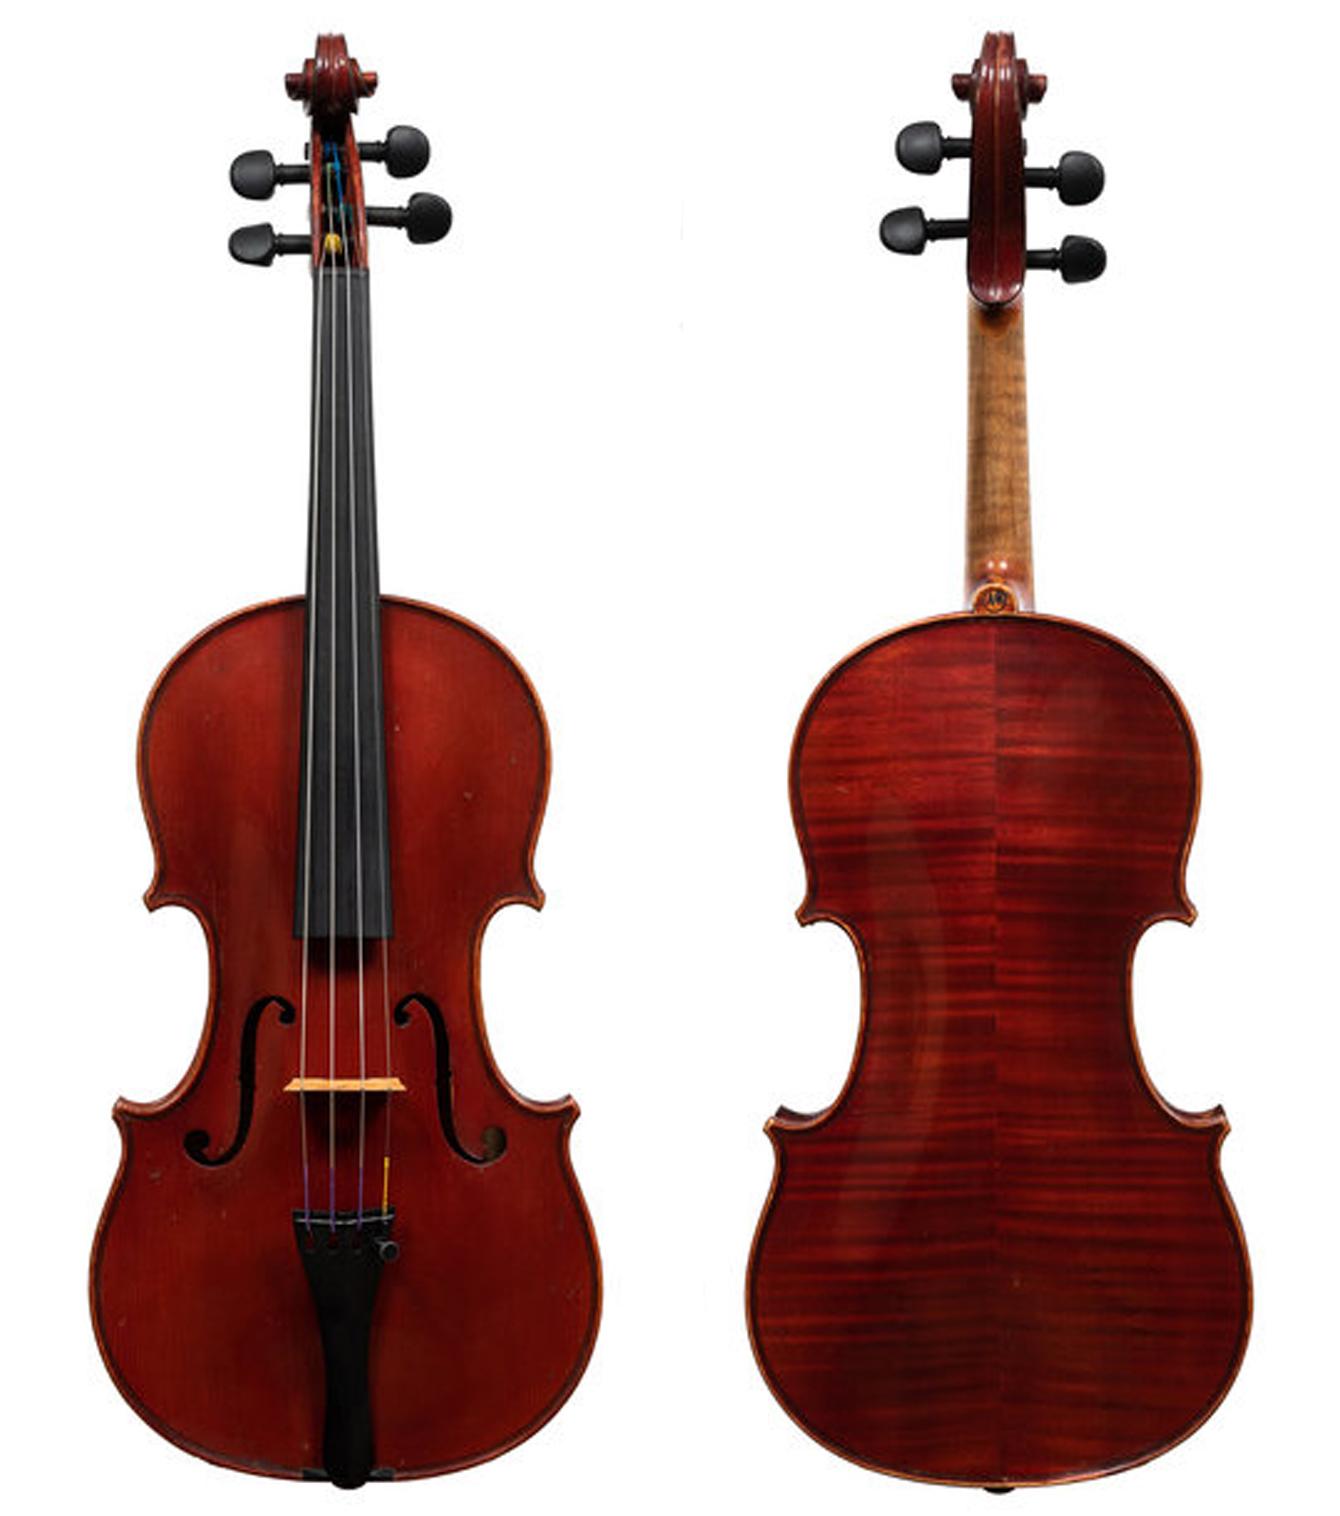 Acoulon & Blondelet Violin